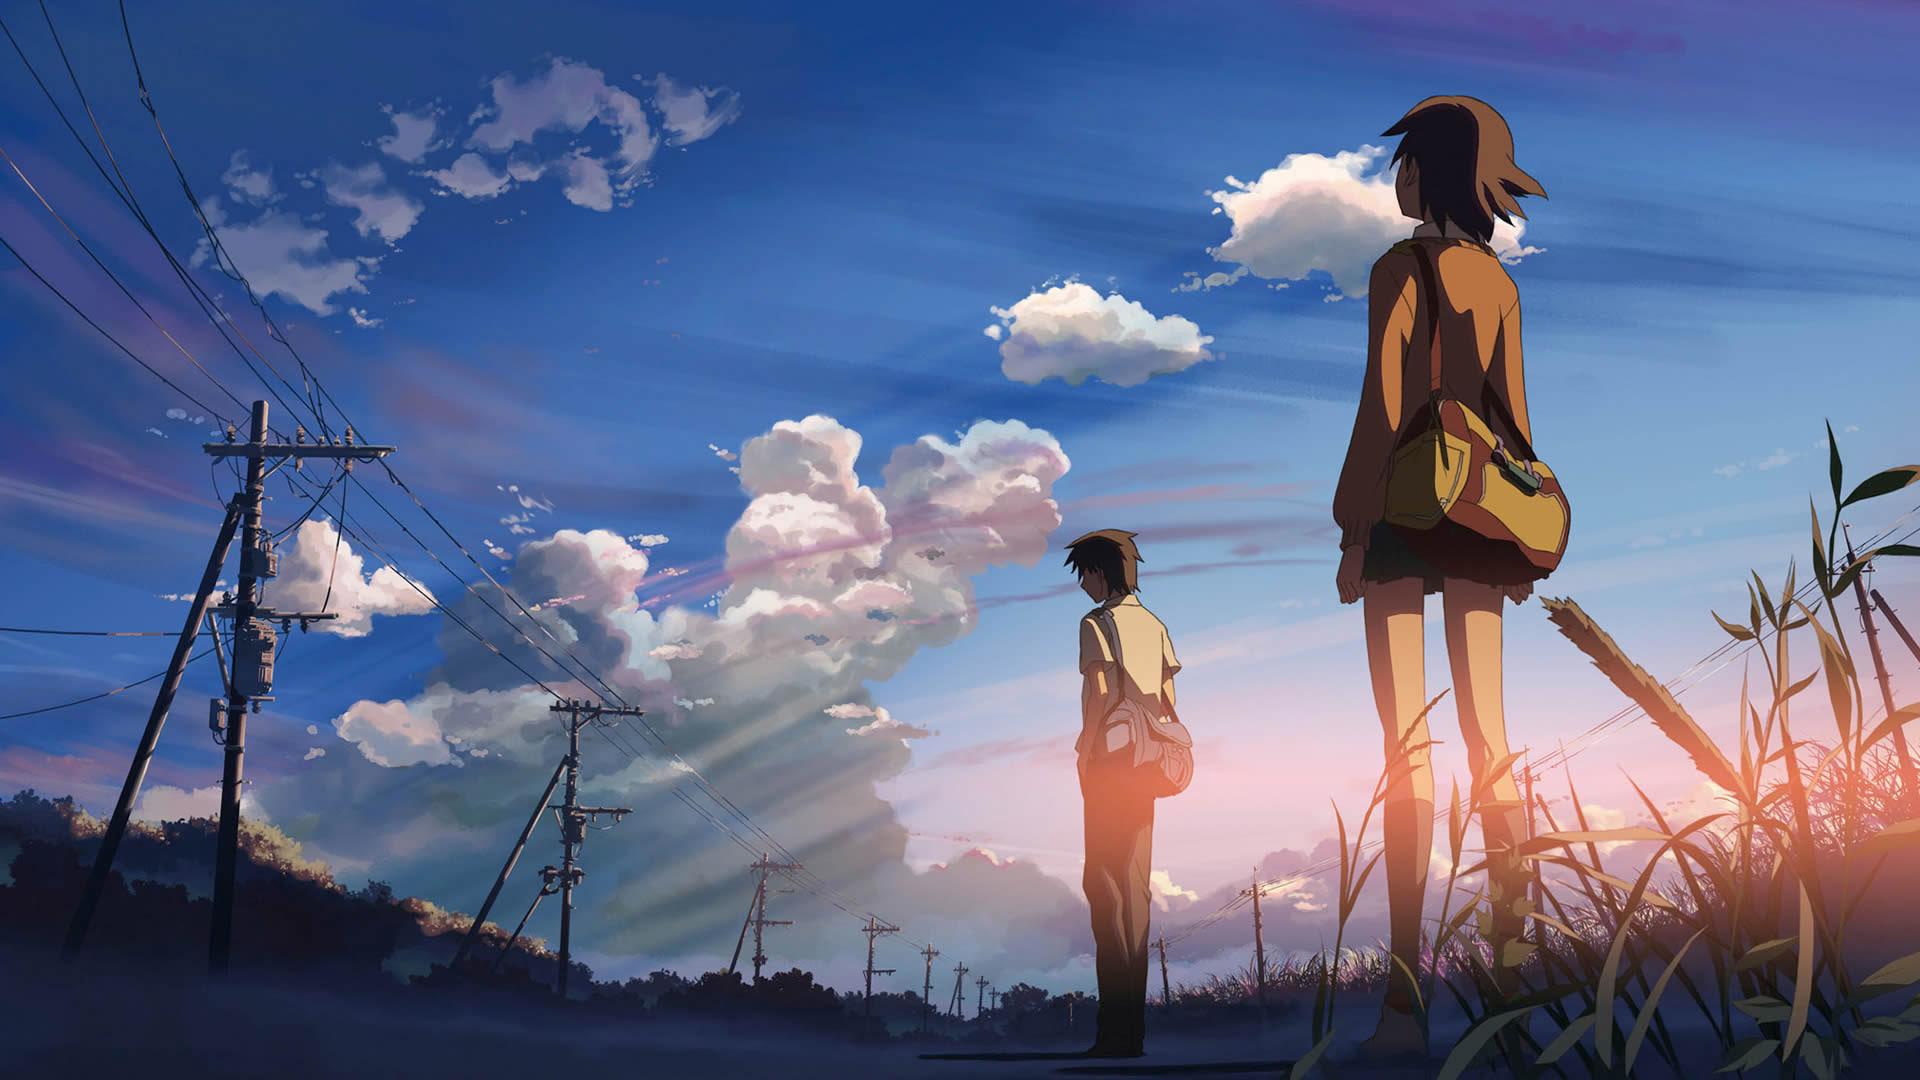 Unduh 700 Wallpaper Anime Laptop Keren HD Terbaru